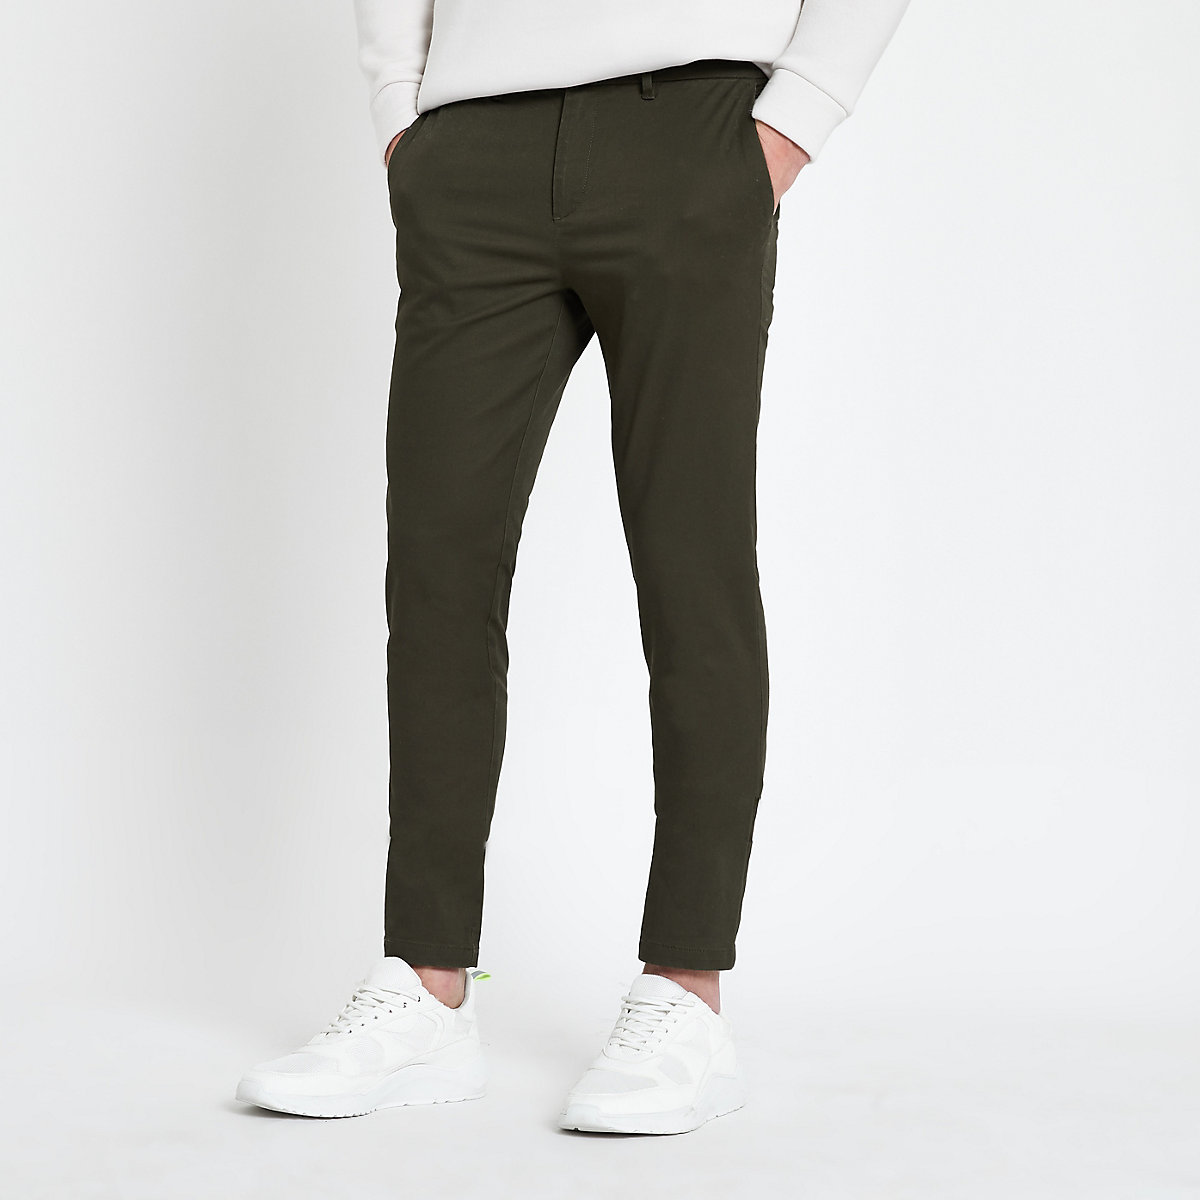 Green skinny fit chino pants